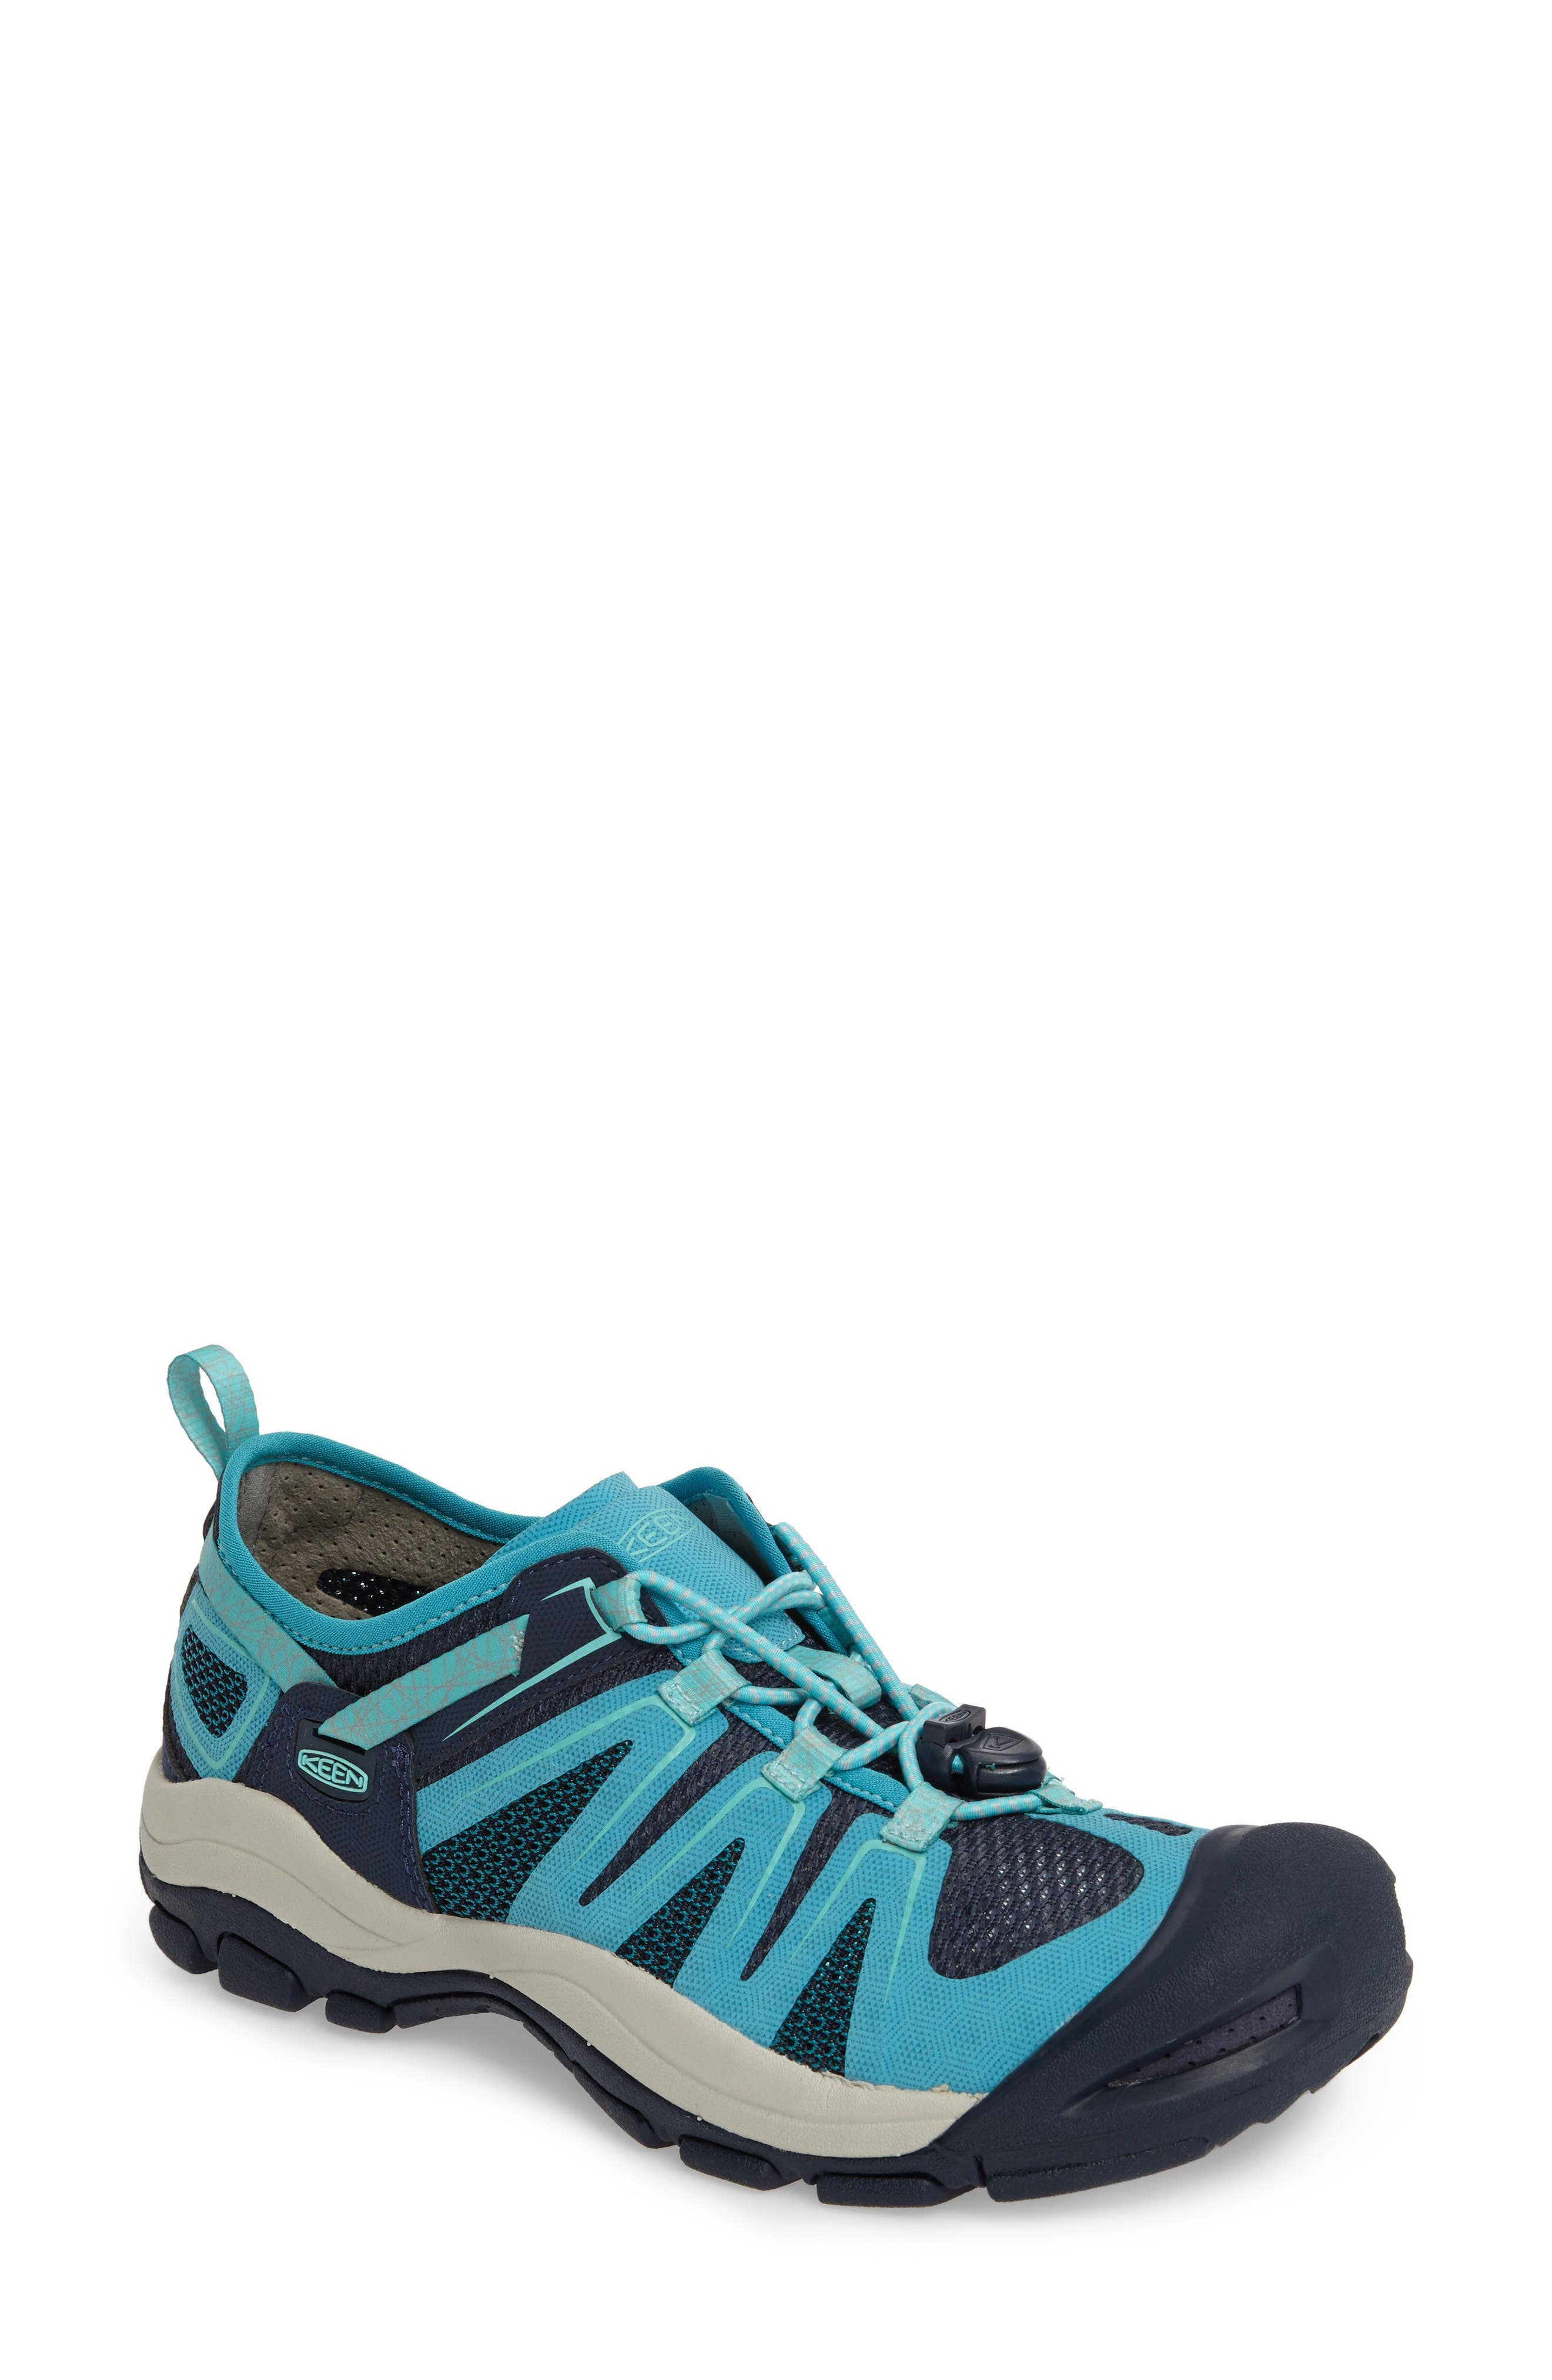 McKenzie II Waterproof Sneaker,                         Main,                         color, Dress Blues/ Algiers Fabric